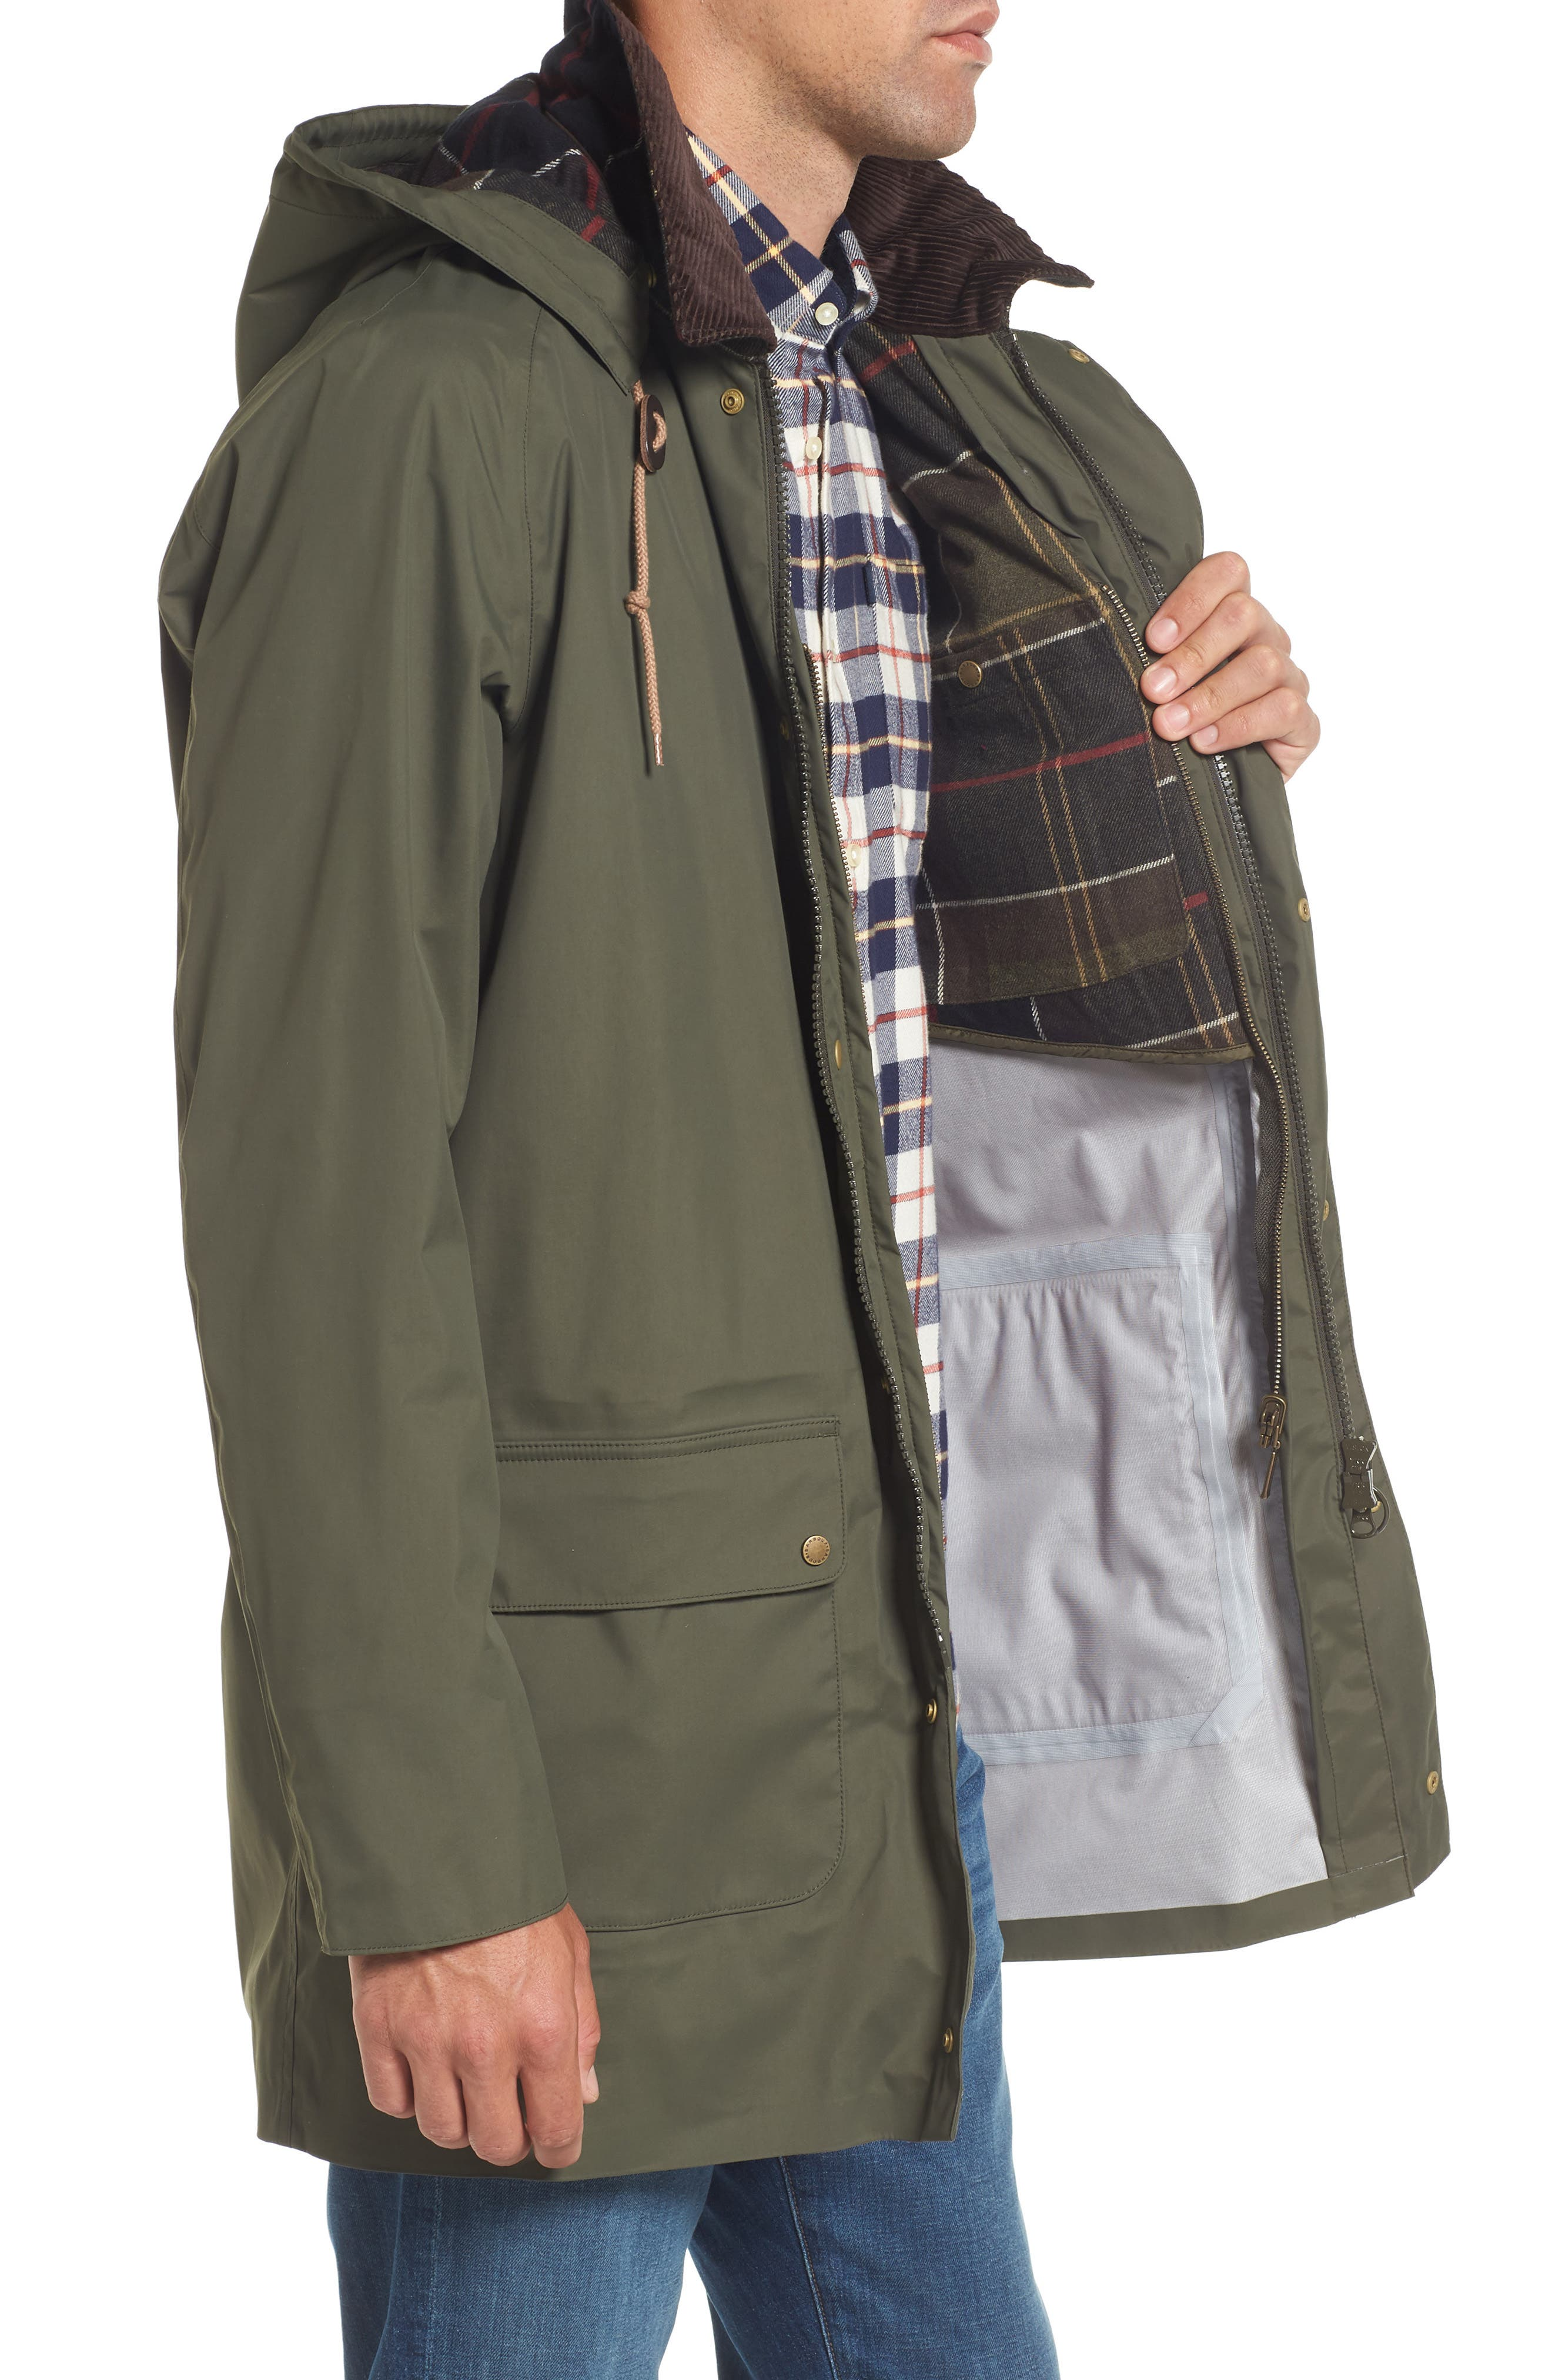 Scarisbrick Waterproof Jacket,                             Alternate thumbnail 3, color,                             340